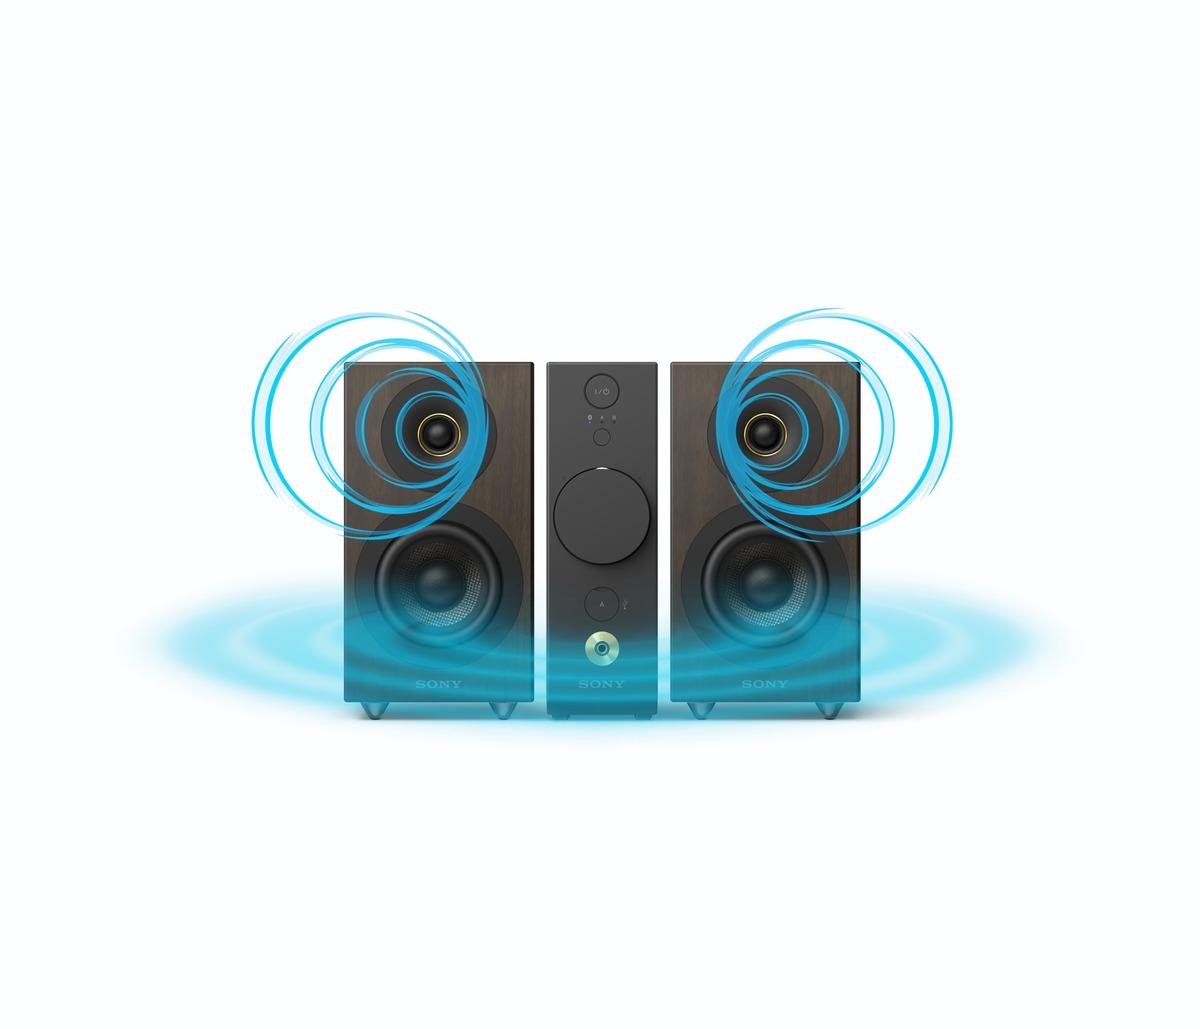 Sony High-Resolution Wireless Audio System - CAS-1